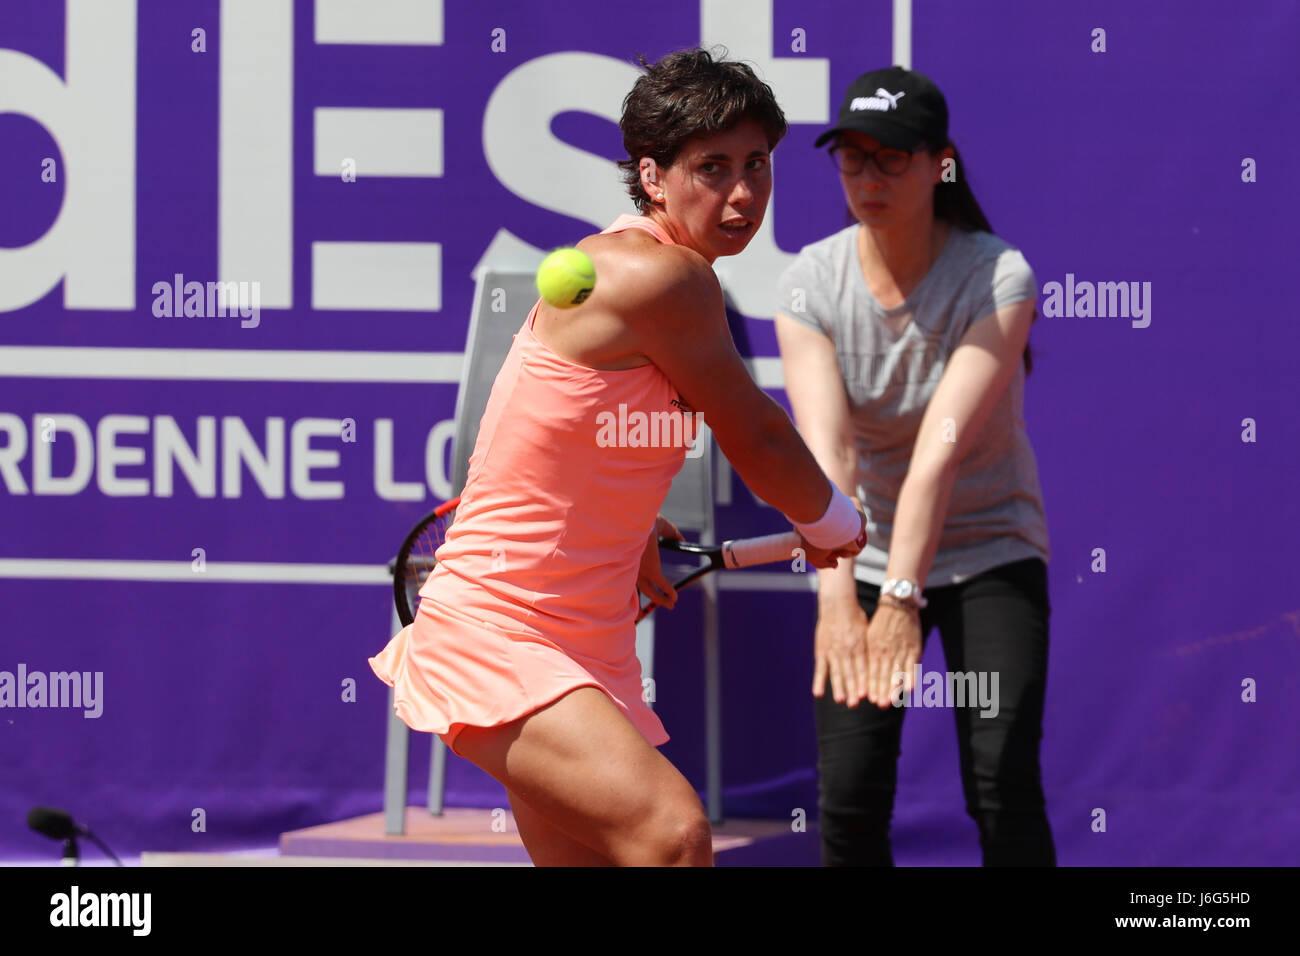 Strasbourg france 21st may 2017 spanish tennis player carla suarez navarro is